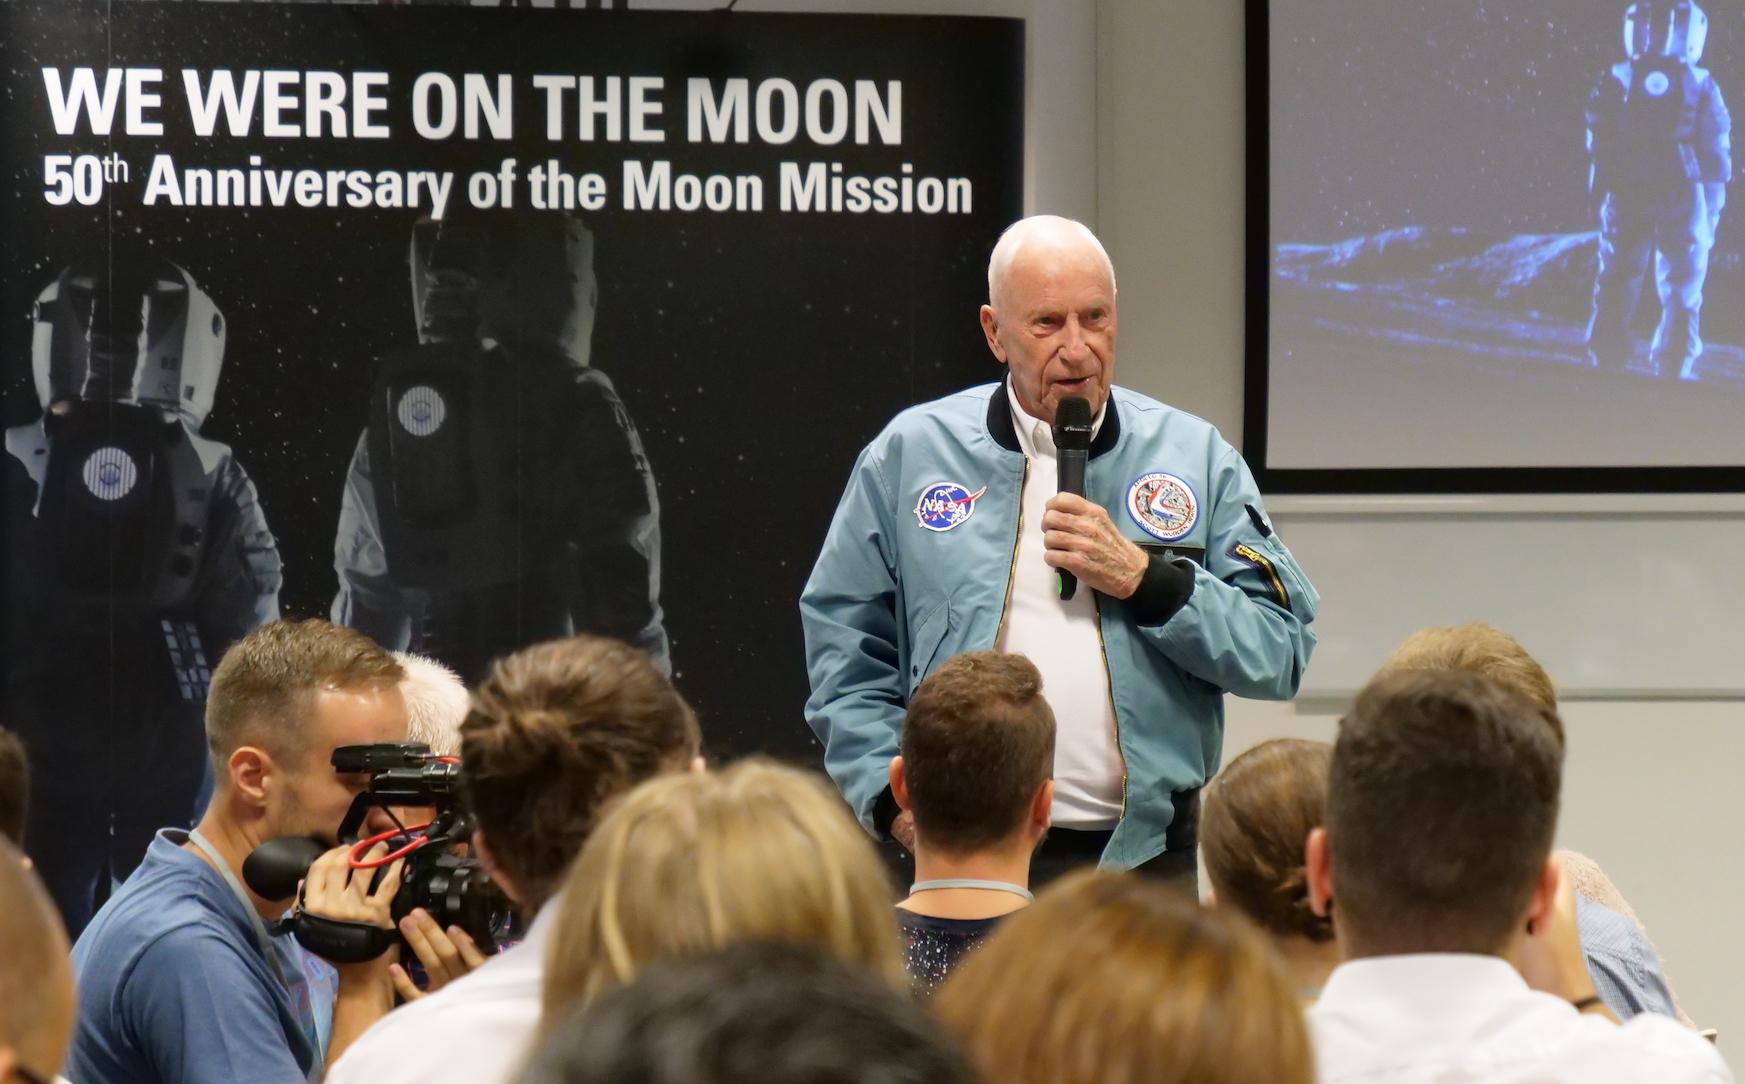 Apollo 15's Al Worden on Mars, space race 2.0 and astronaut humour